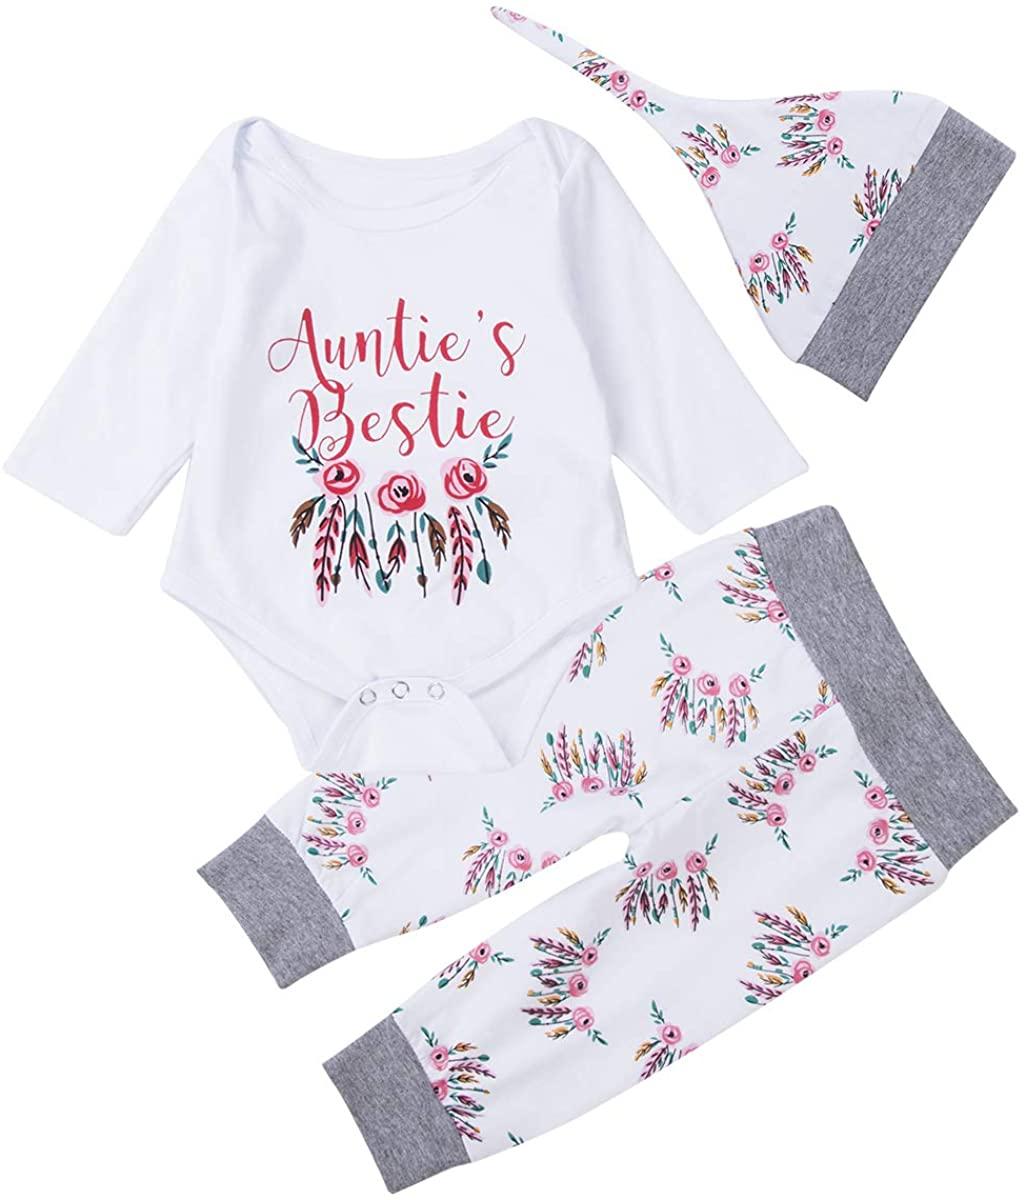 ALUNNI Newborn Infant Baby Girl Clothes Auntie's Bestie Romper Long Sleeve Bodysuit +Flower Print Pants Hat Headband Outfits